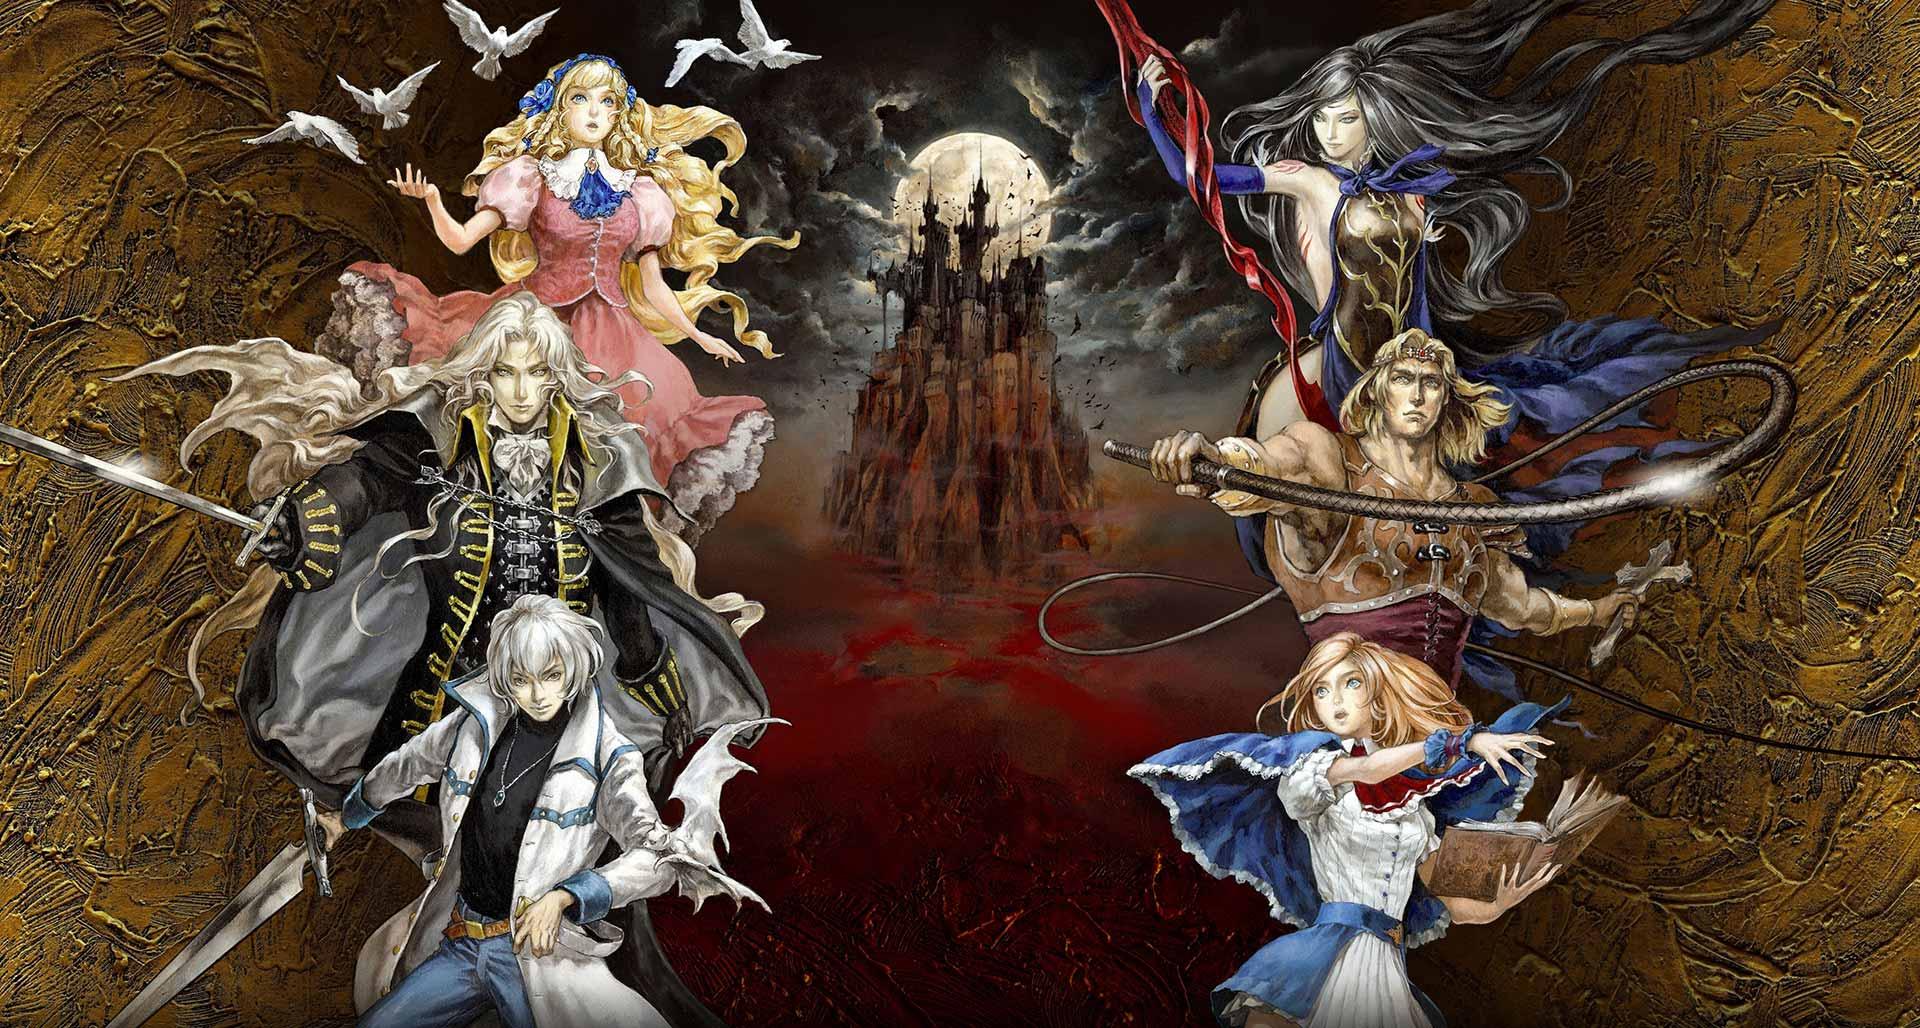 Key Art From Castlevania: Grimoire of Souls